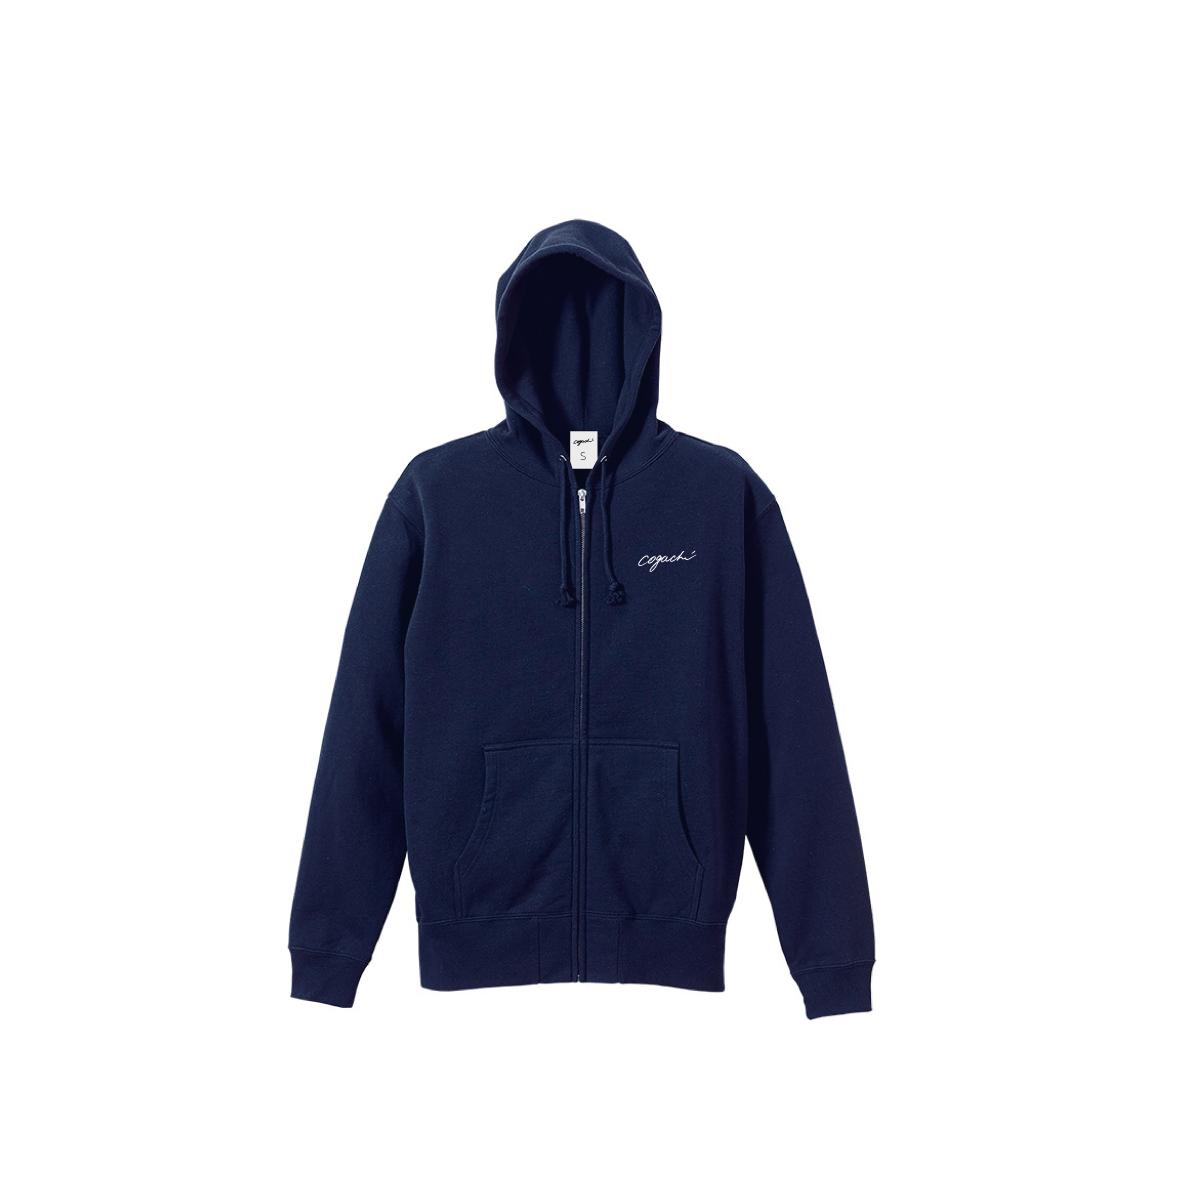 1991 zip hoodie(NAVY)